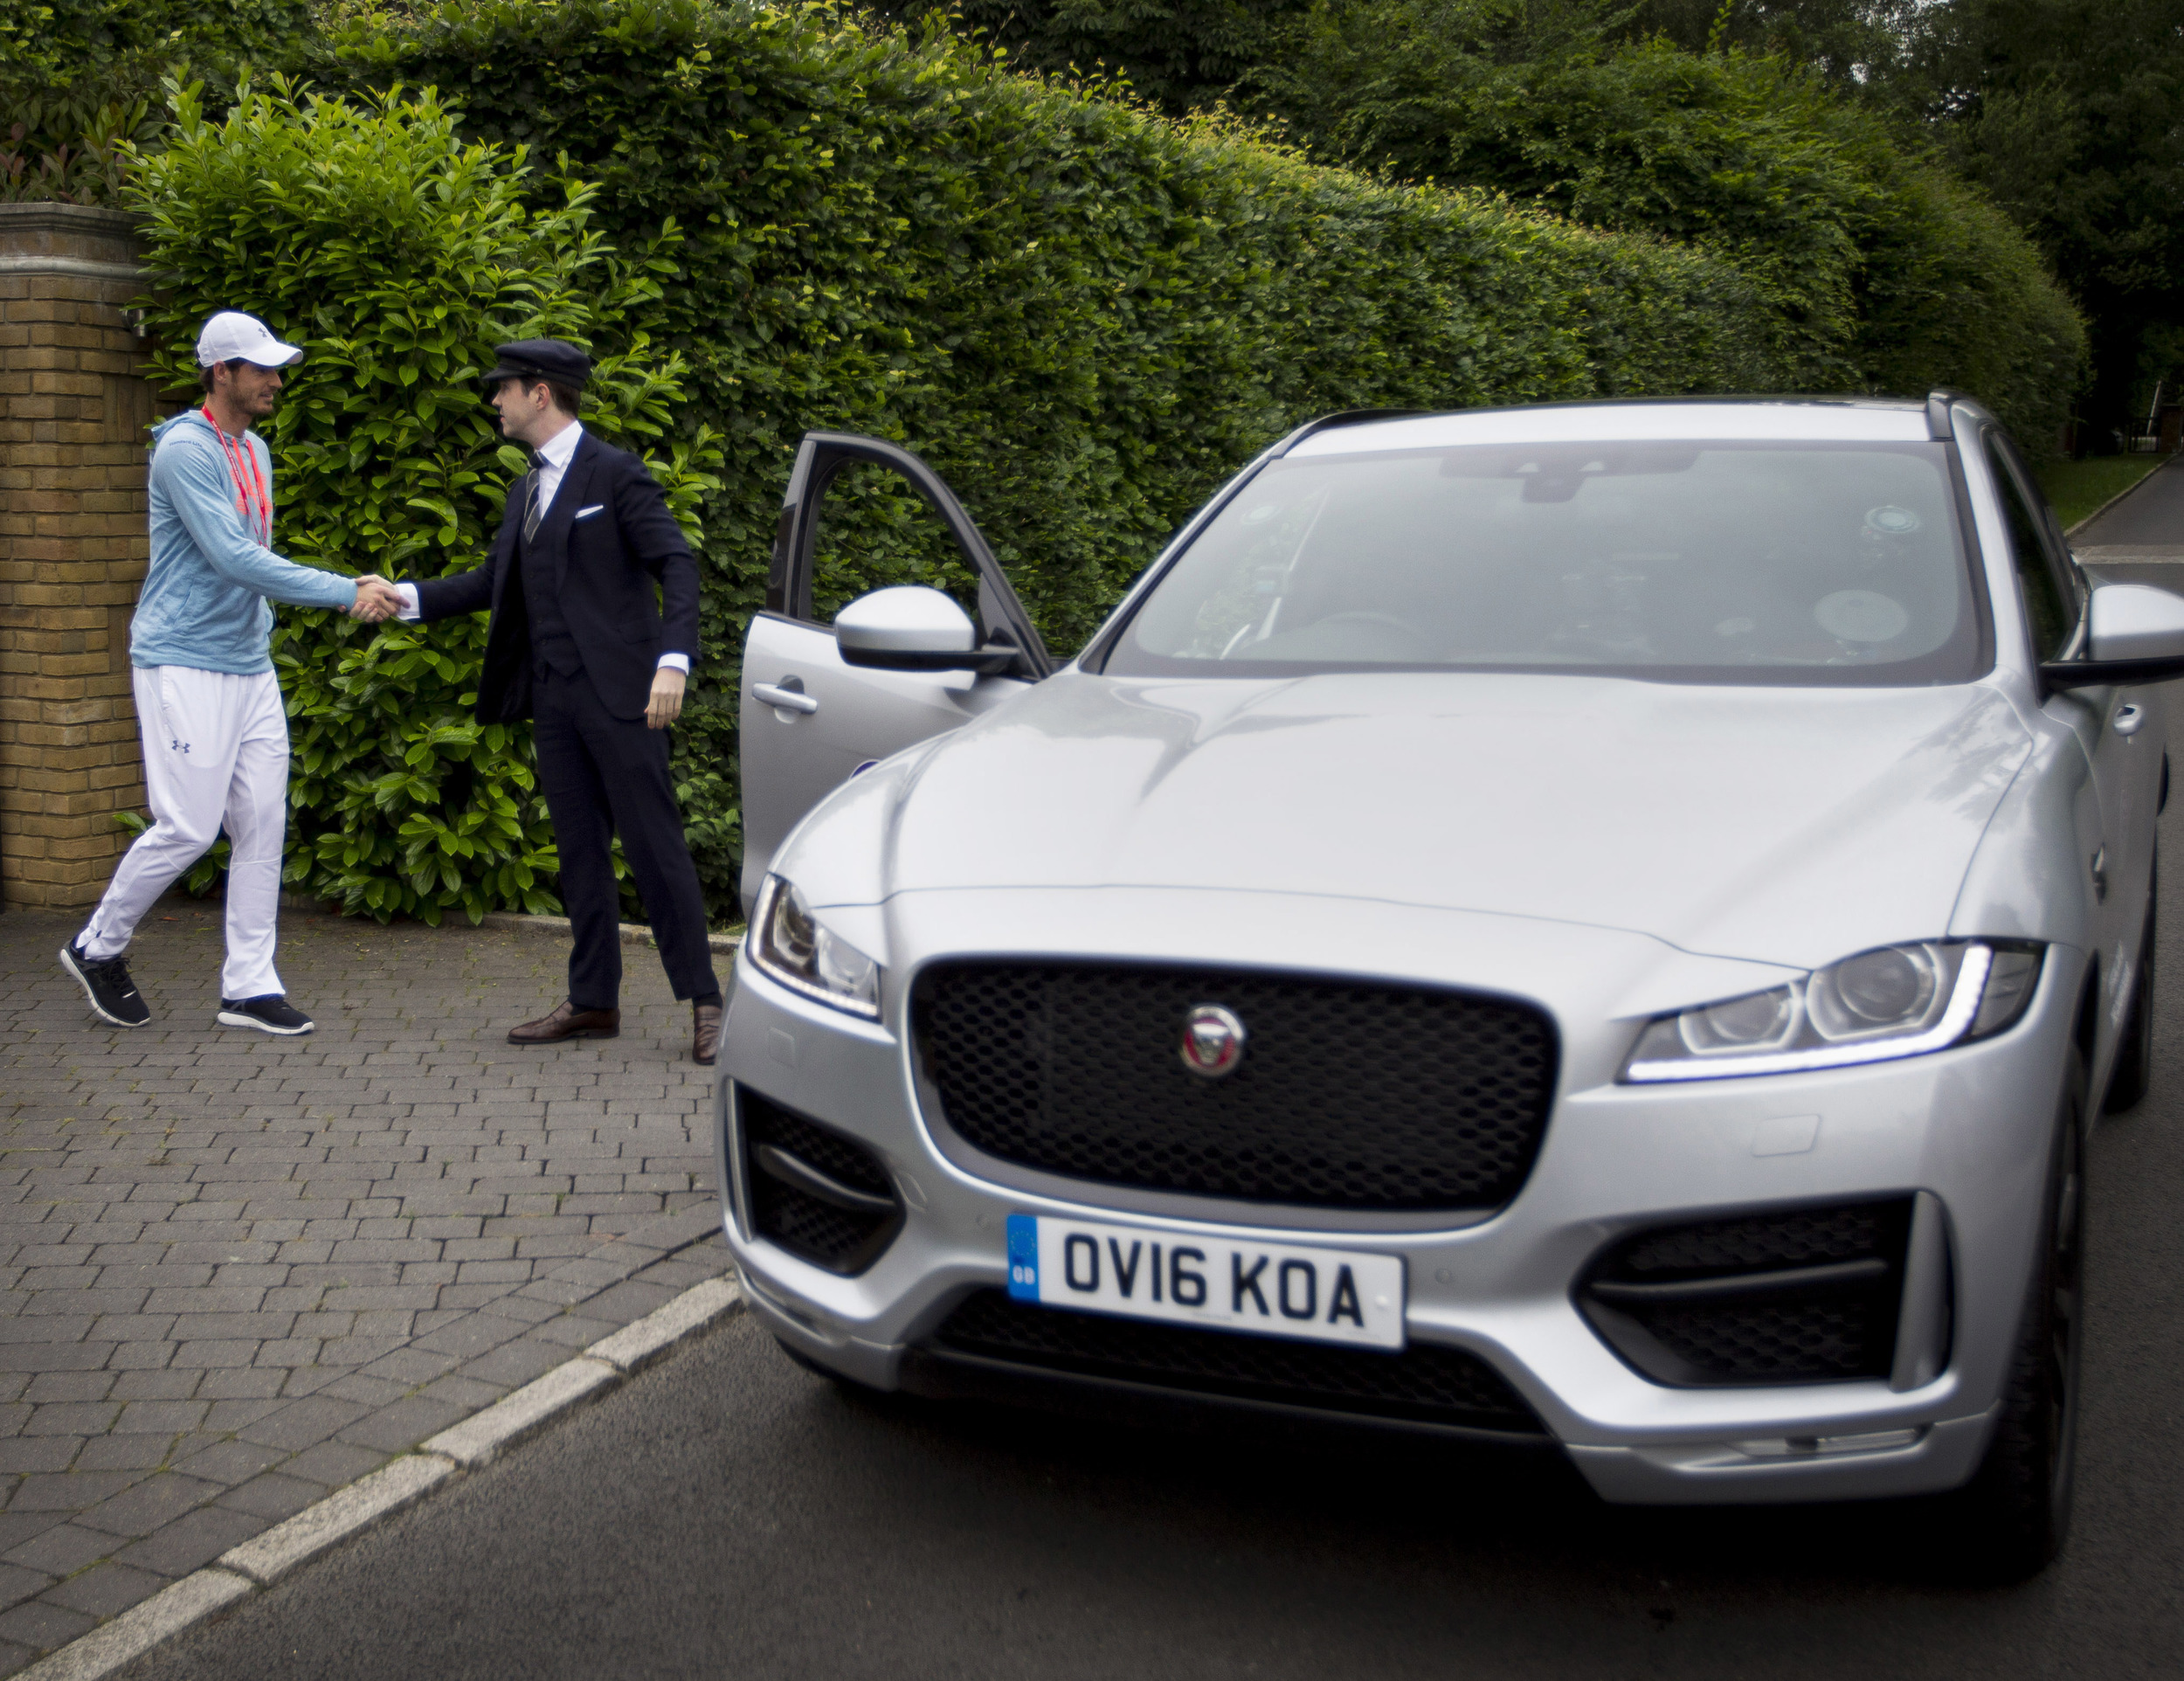 Jaguar Secret Chauffeur (a).jpg